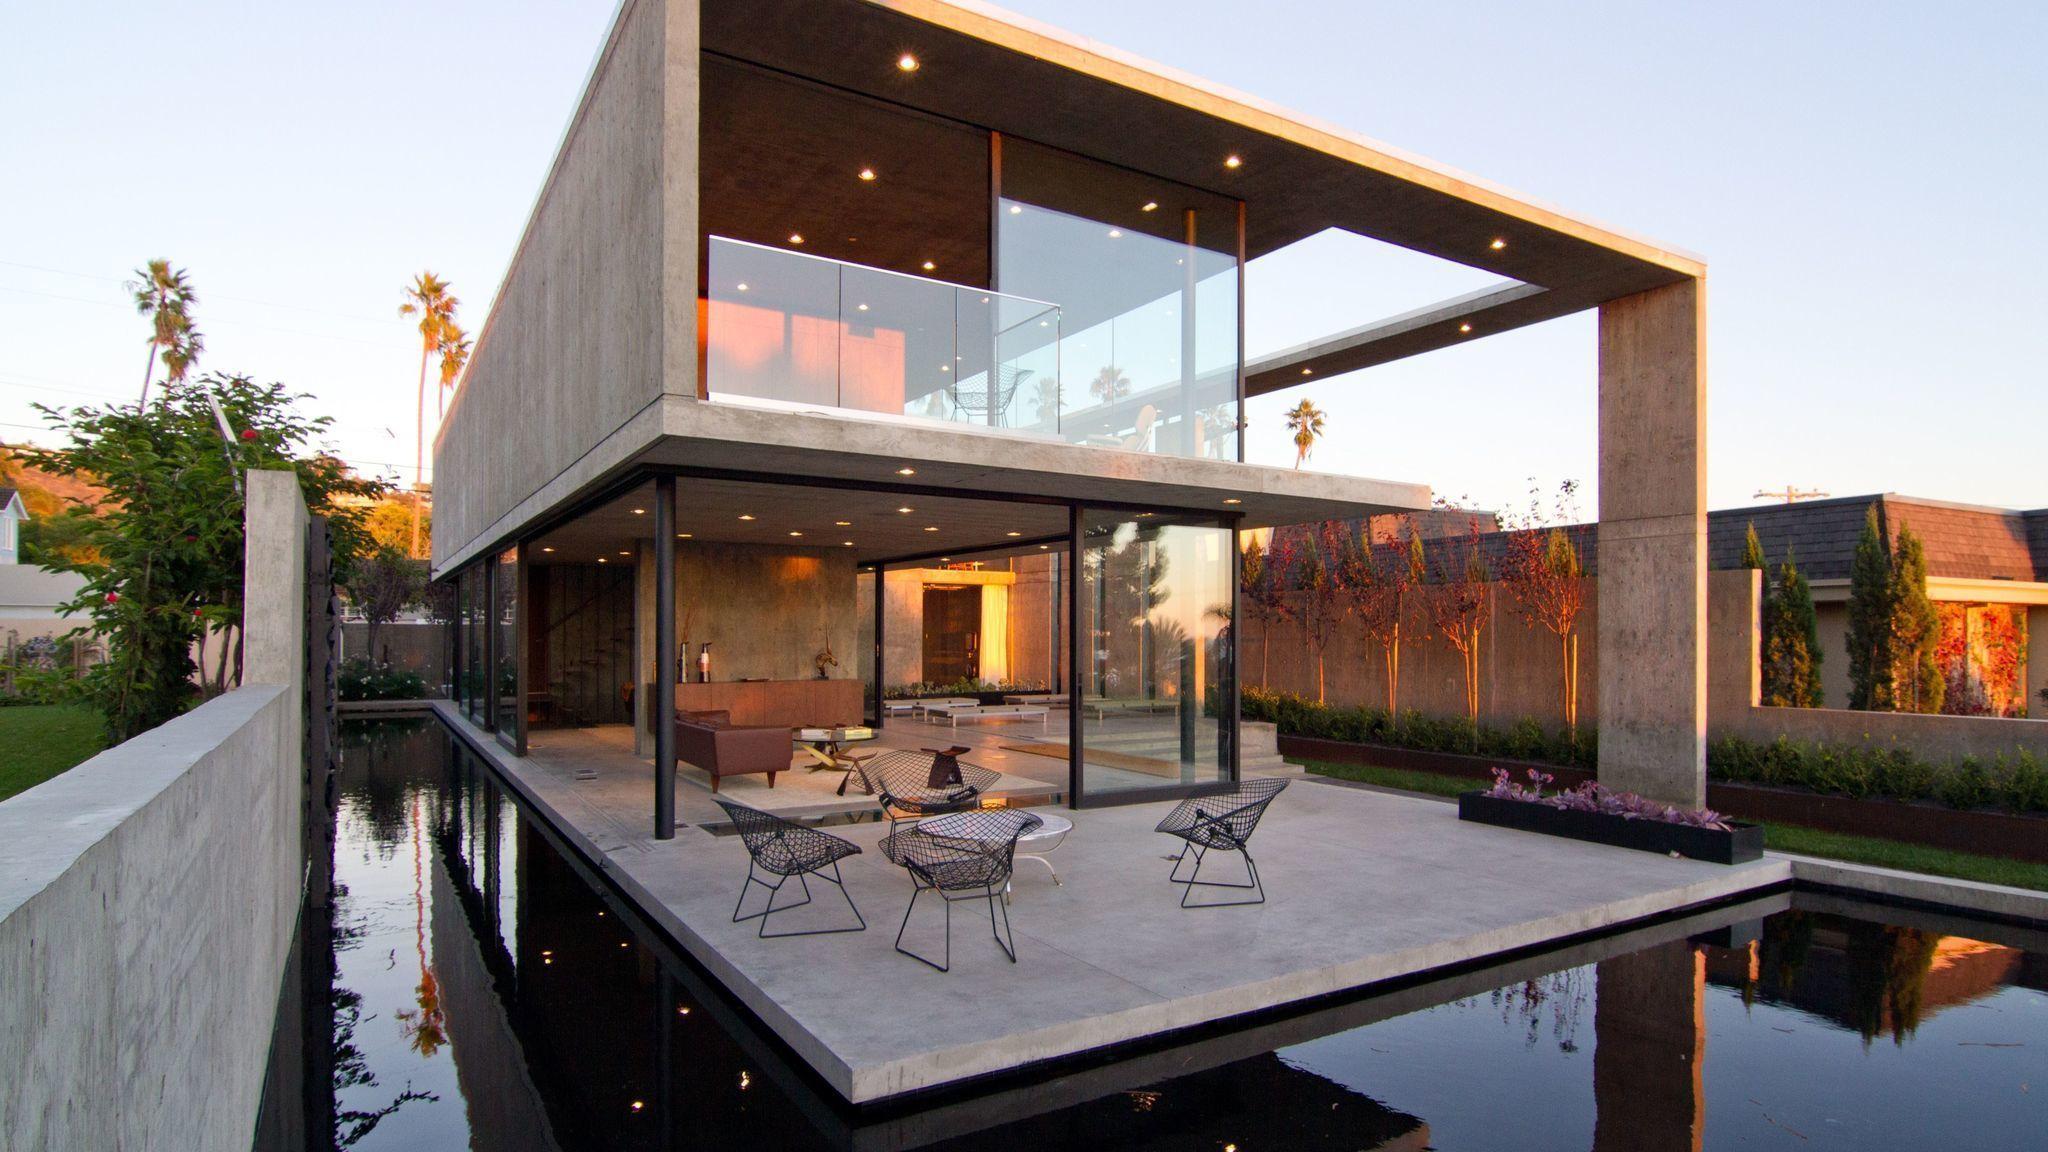 U0027Floatingu0027 Concrete House Wins Top Architecture Award   The San Diego  Union Tribune